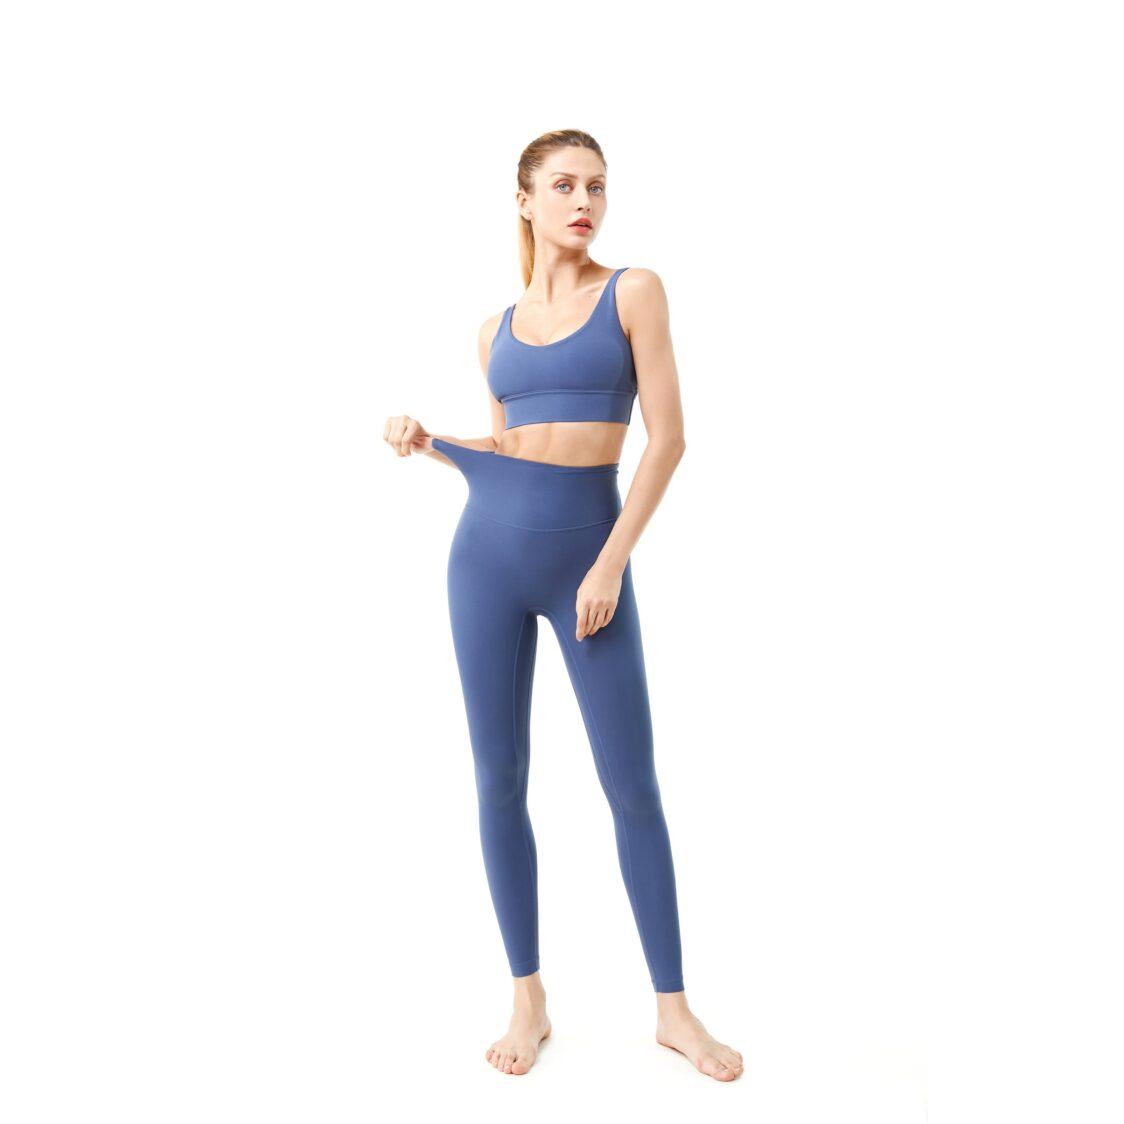 YOF Athletica Move Active Yoga Set Blue